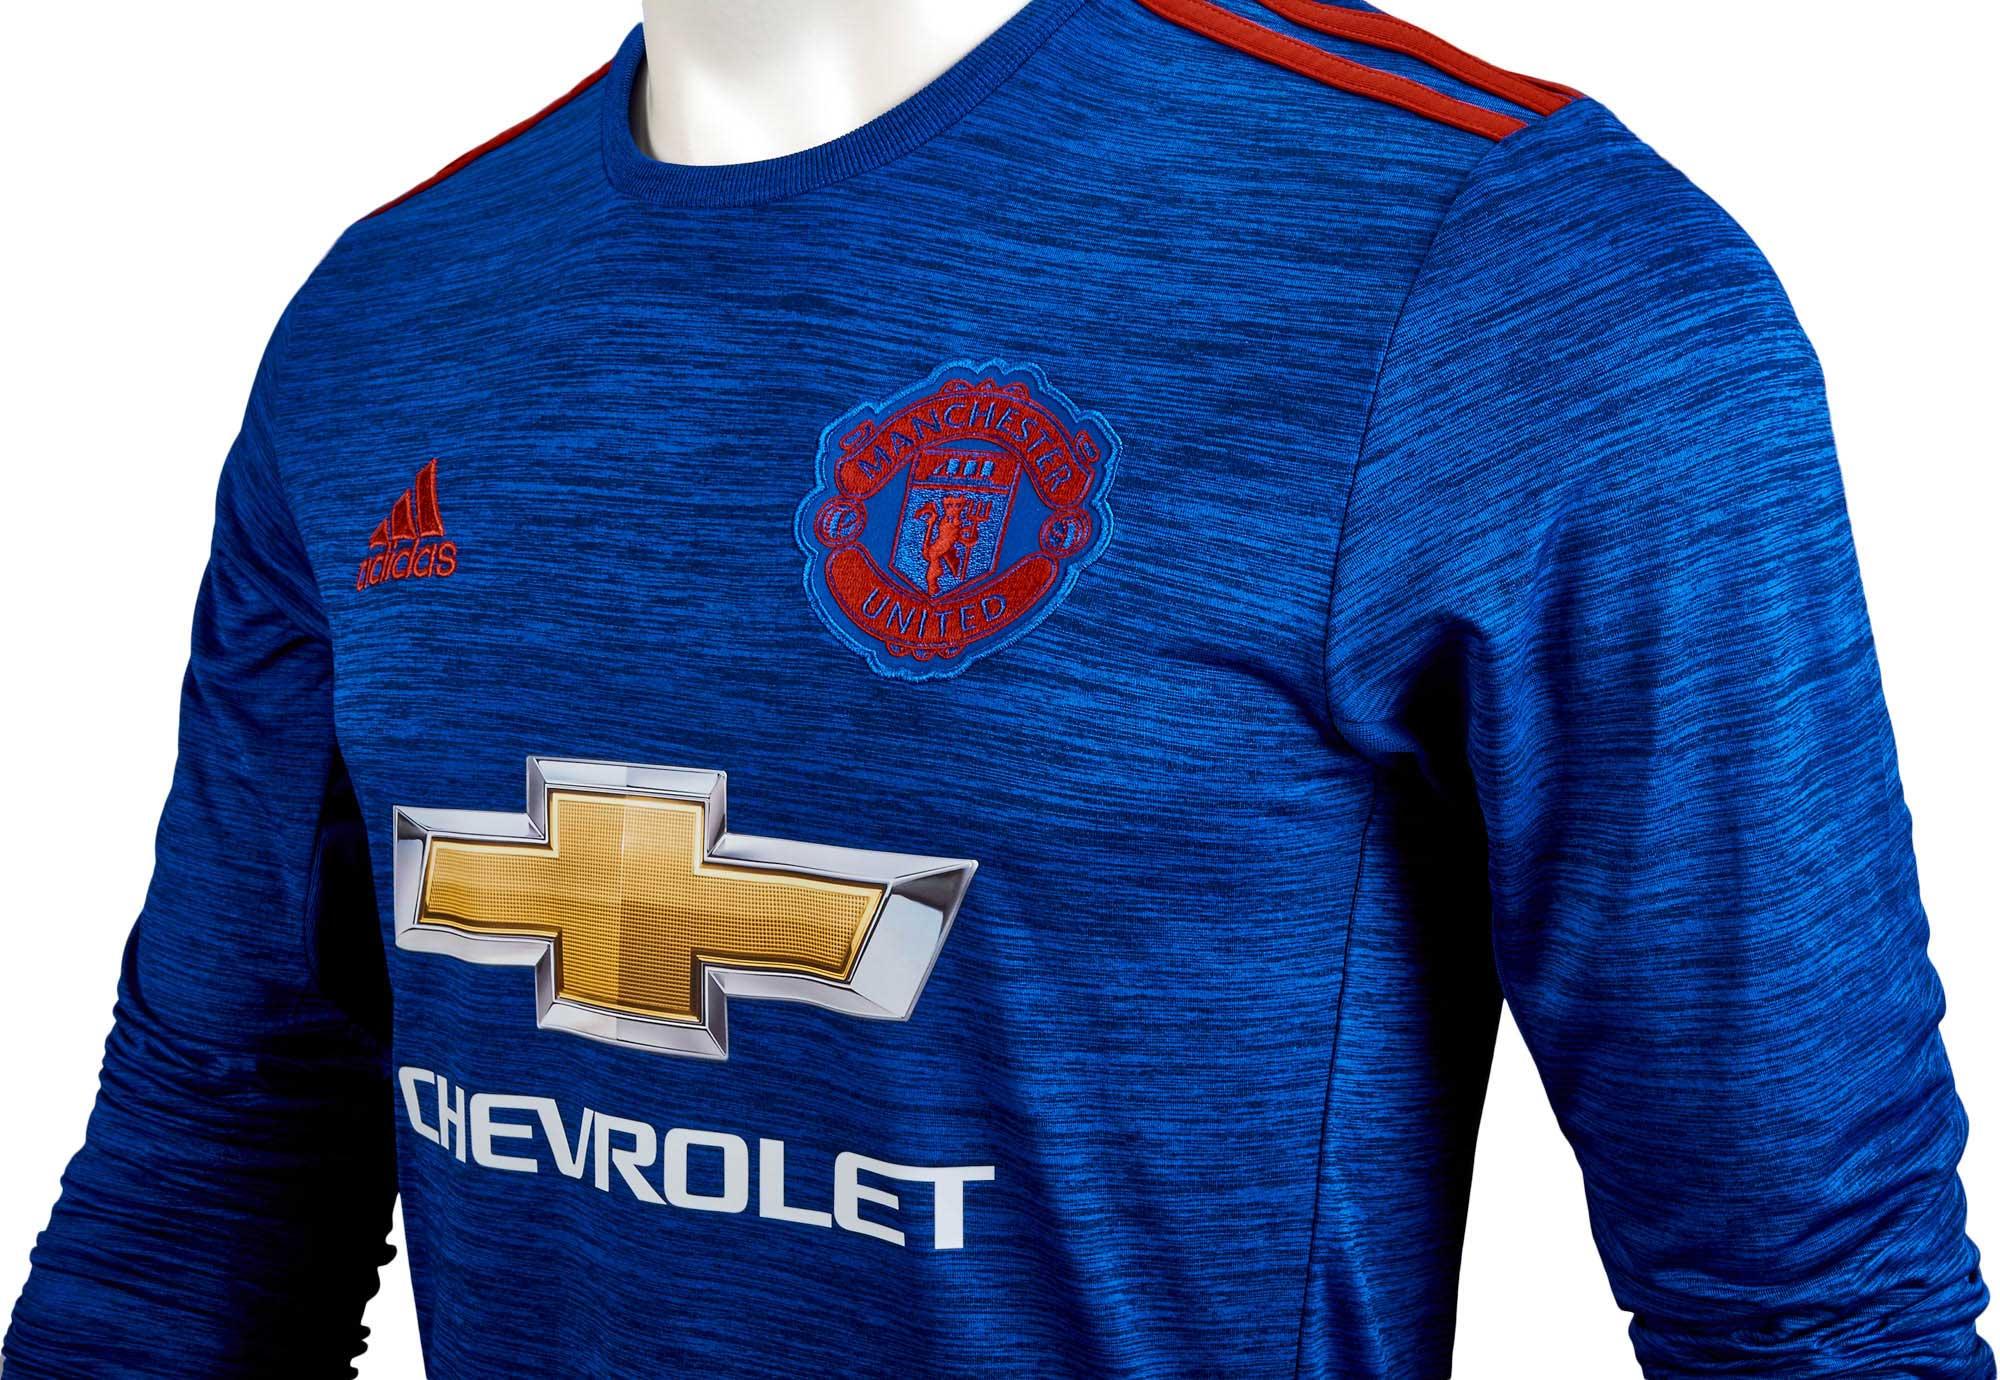 e07a0804f adidas Manchester United L S Jersey - 2016 Man United Away Jerseys